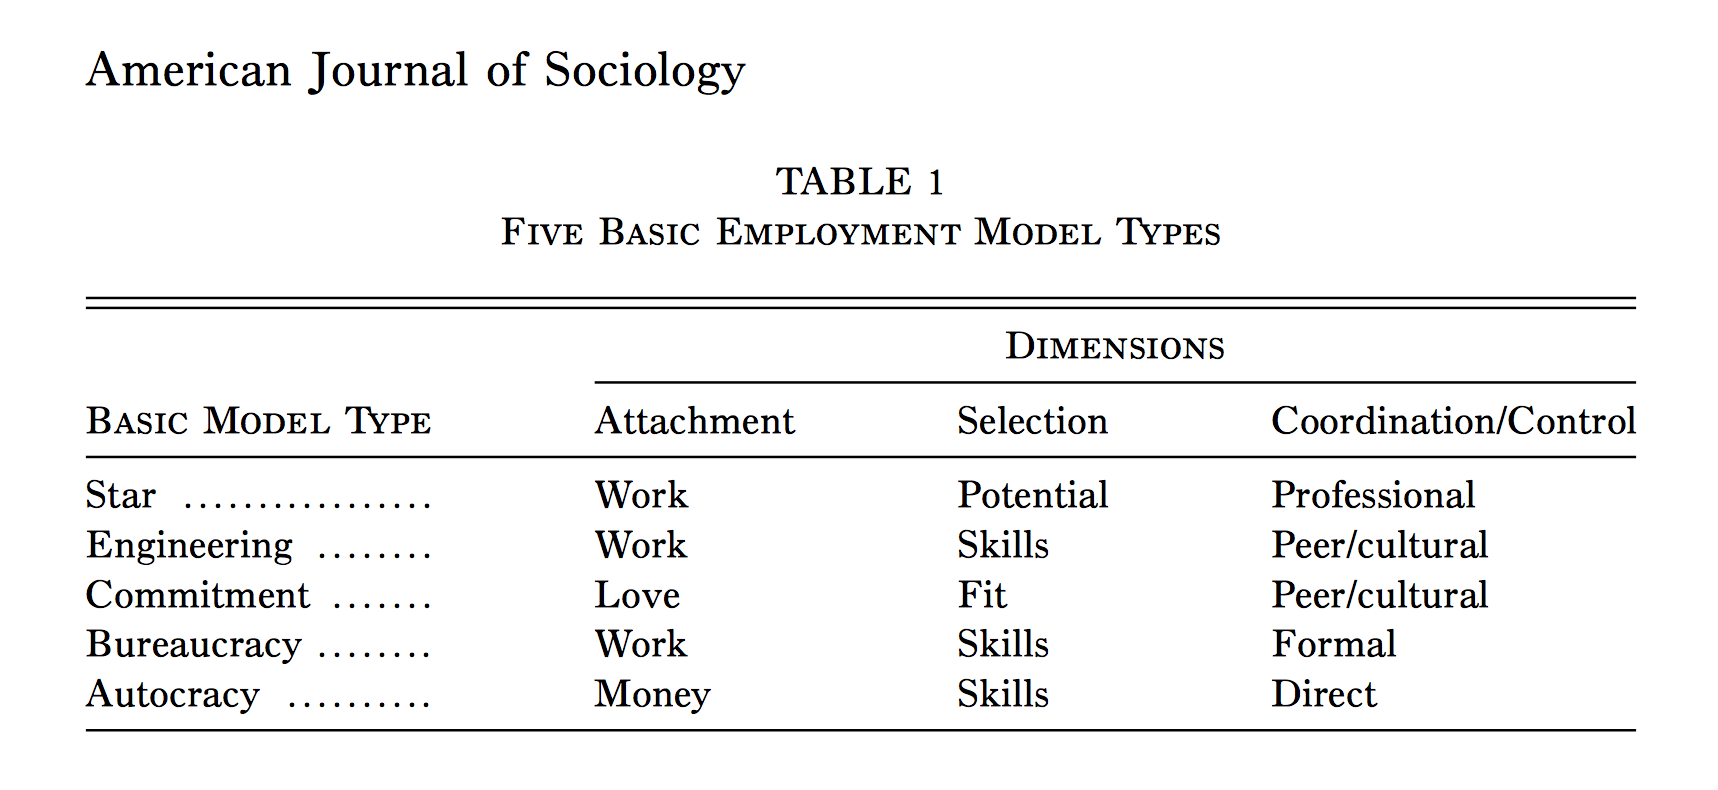 american_journal_of_sociology.png